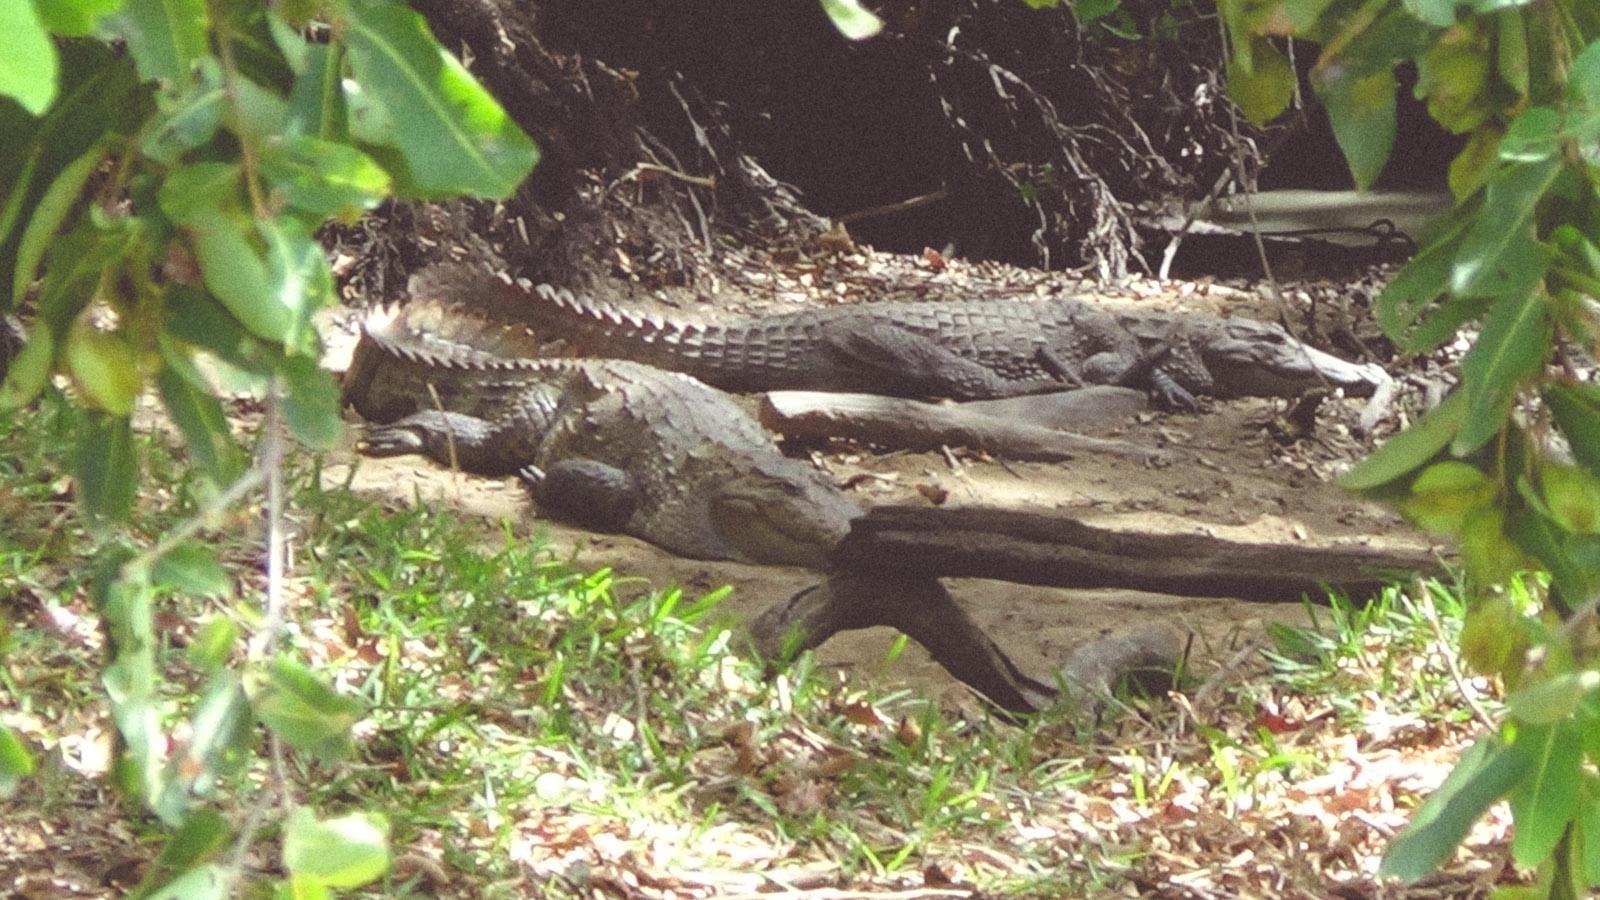 Sri Lanka-Hikkaduwa-Midigama-Aragum Bay-Sunshinestories-surf-travel-blog-DSC01970